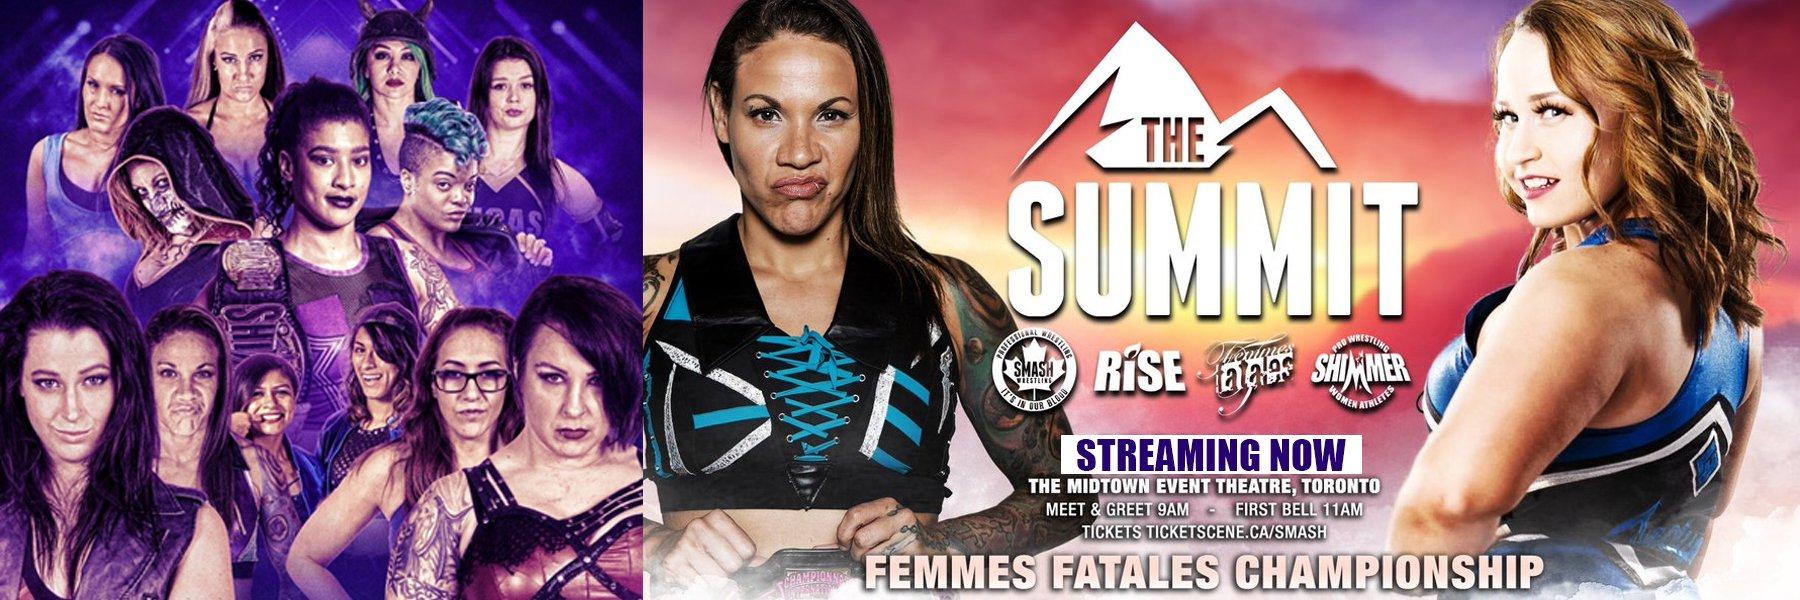 Watch RISE The Summit! Mercedes Martinez vs Jordynne Grace, Aerial Monroe